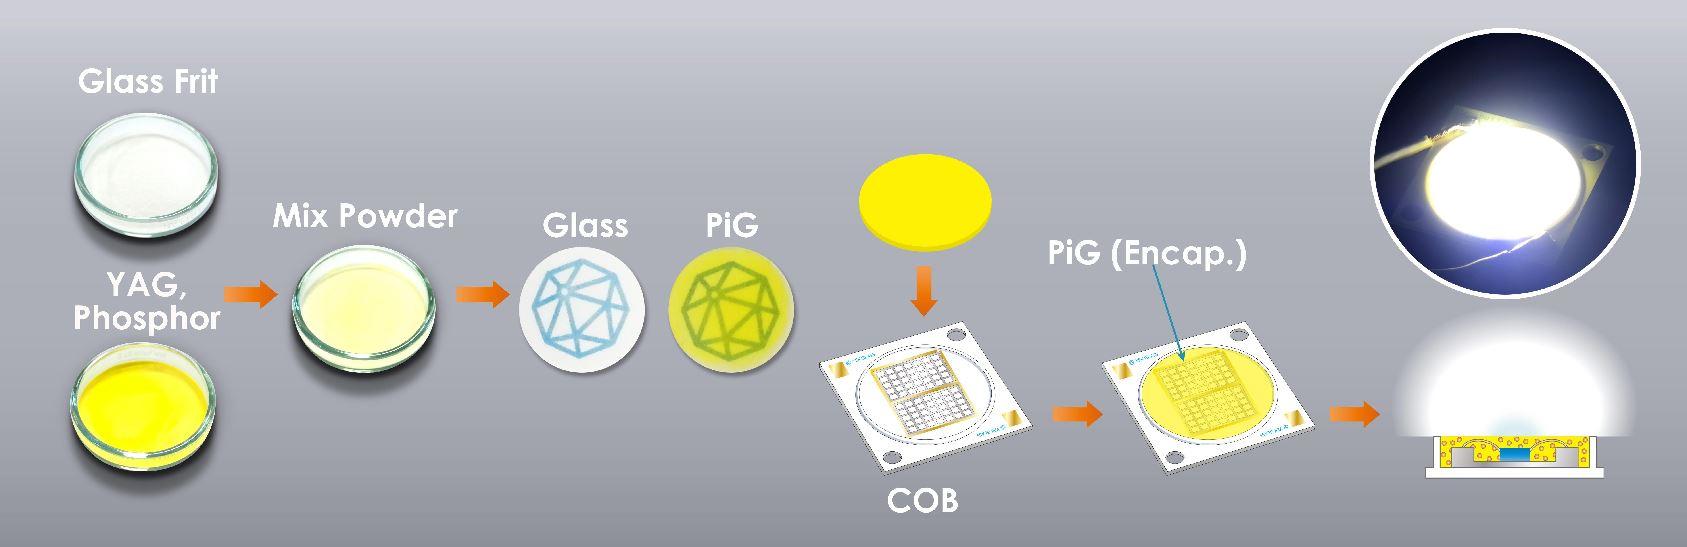 PIG Process Image.JPG